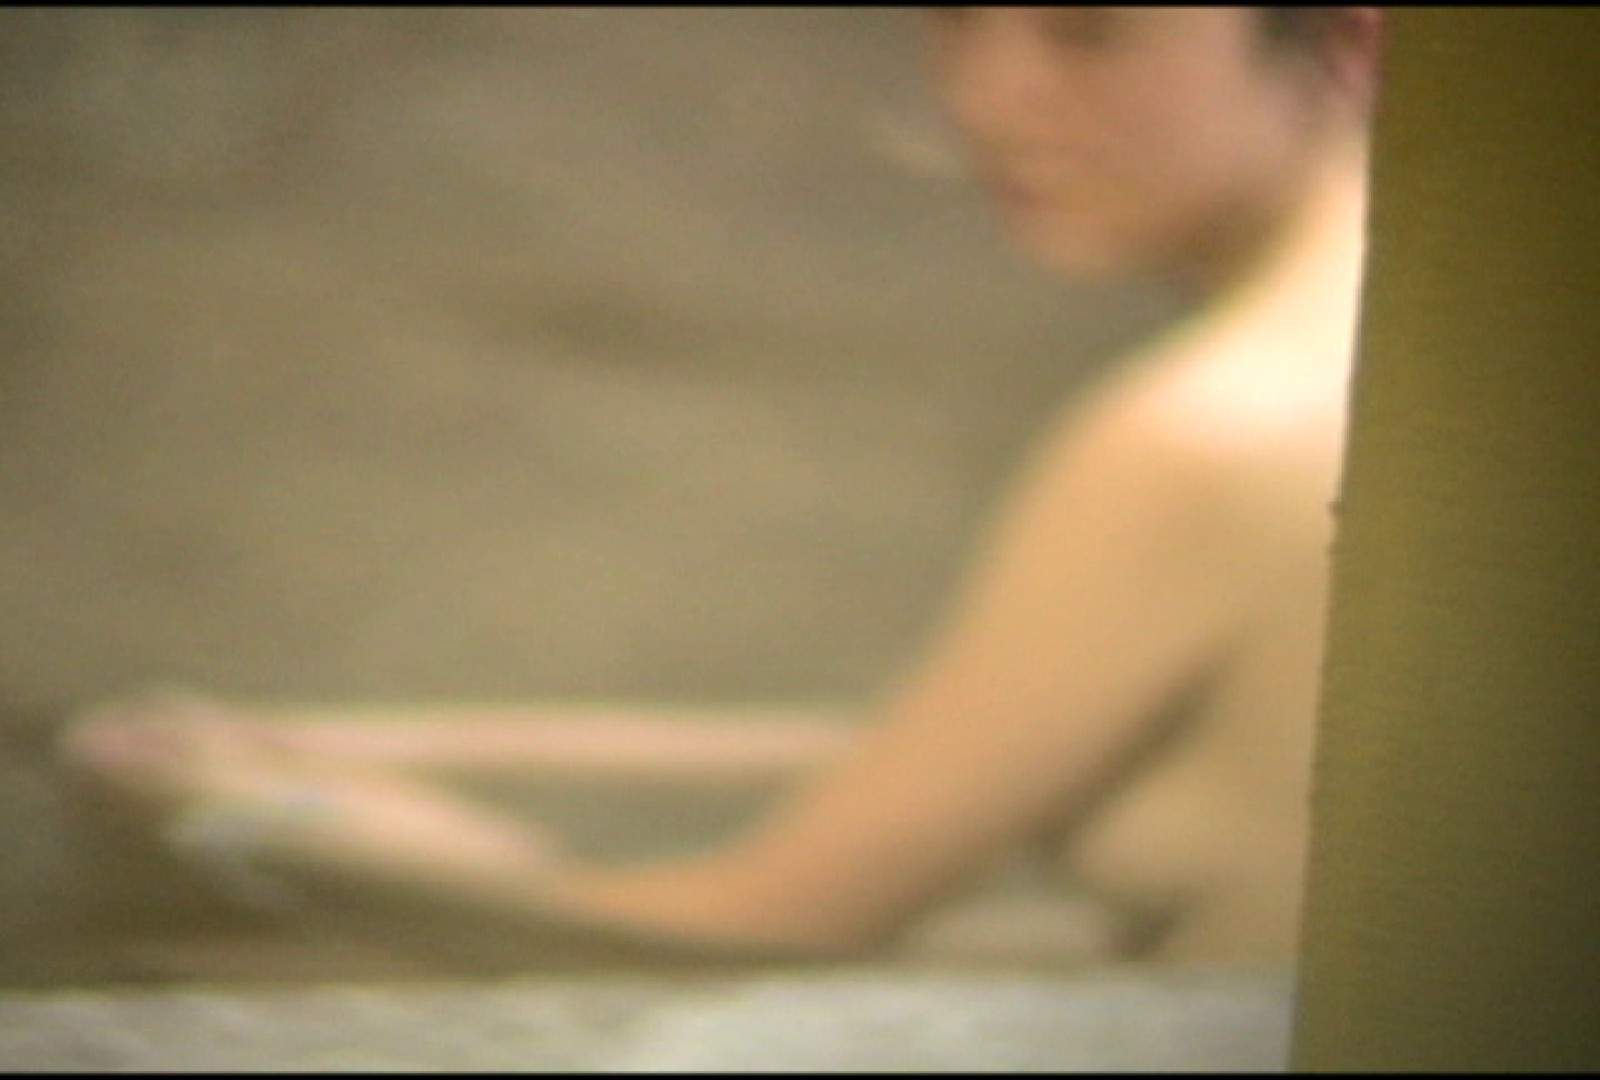 Aquaな露天風呂Vol.699 美しいOLの裸体 | 露天風呂突入  101pic 10